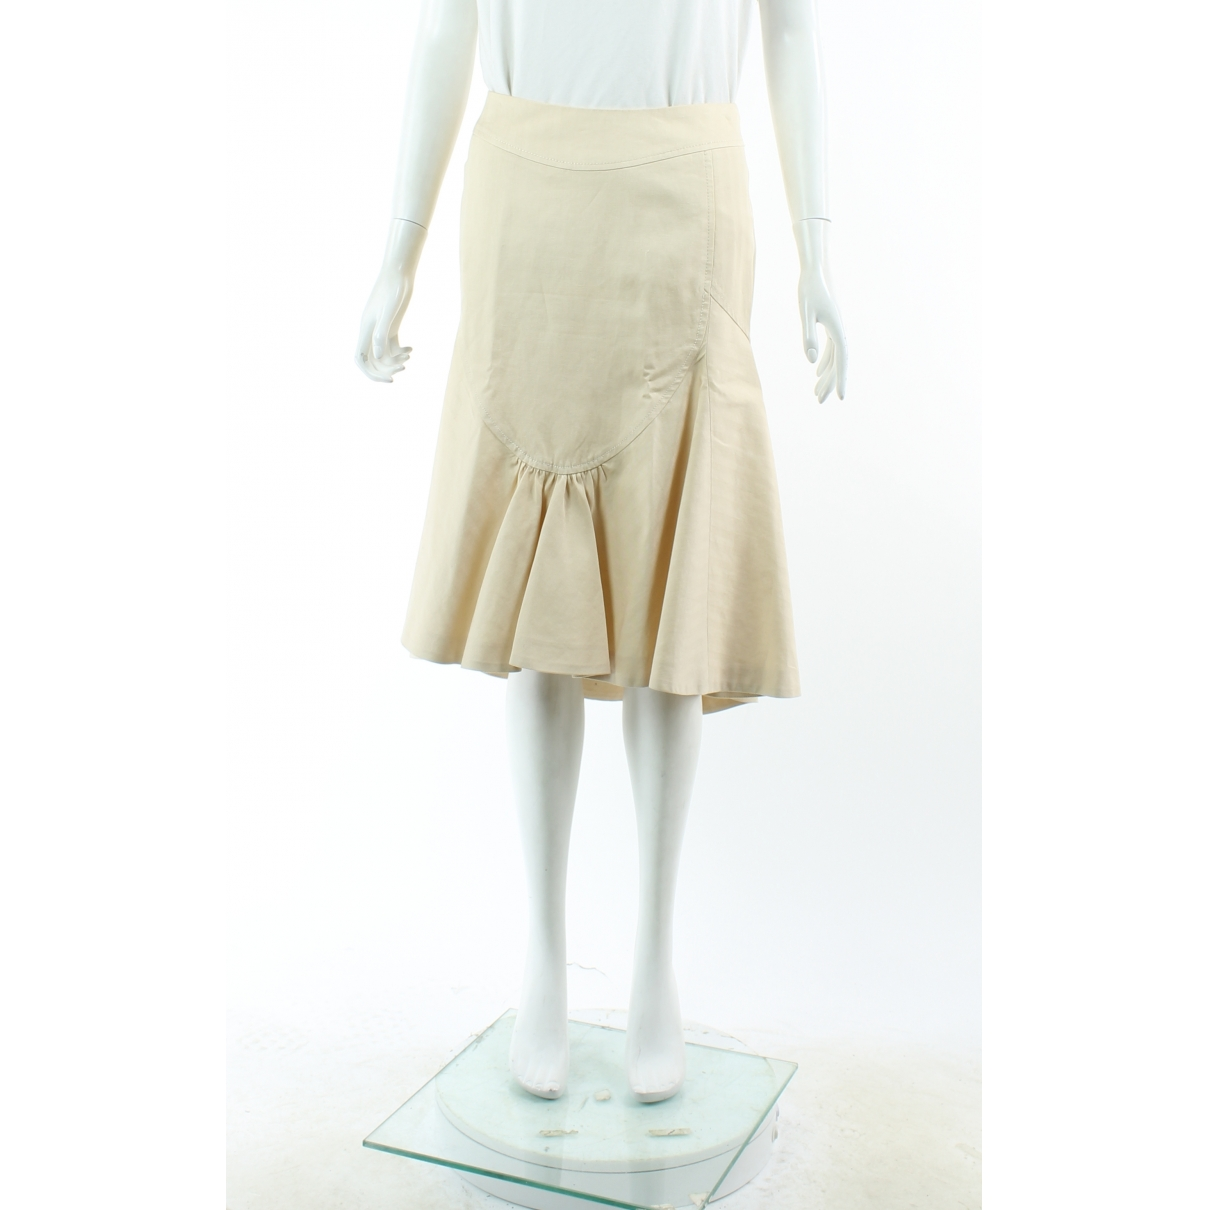 Kenzo \N Ecru Cotton skirt for Women 40 FR